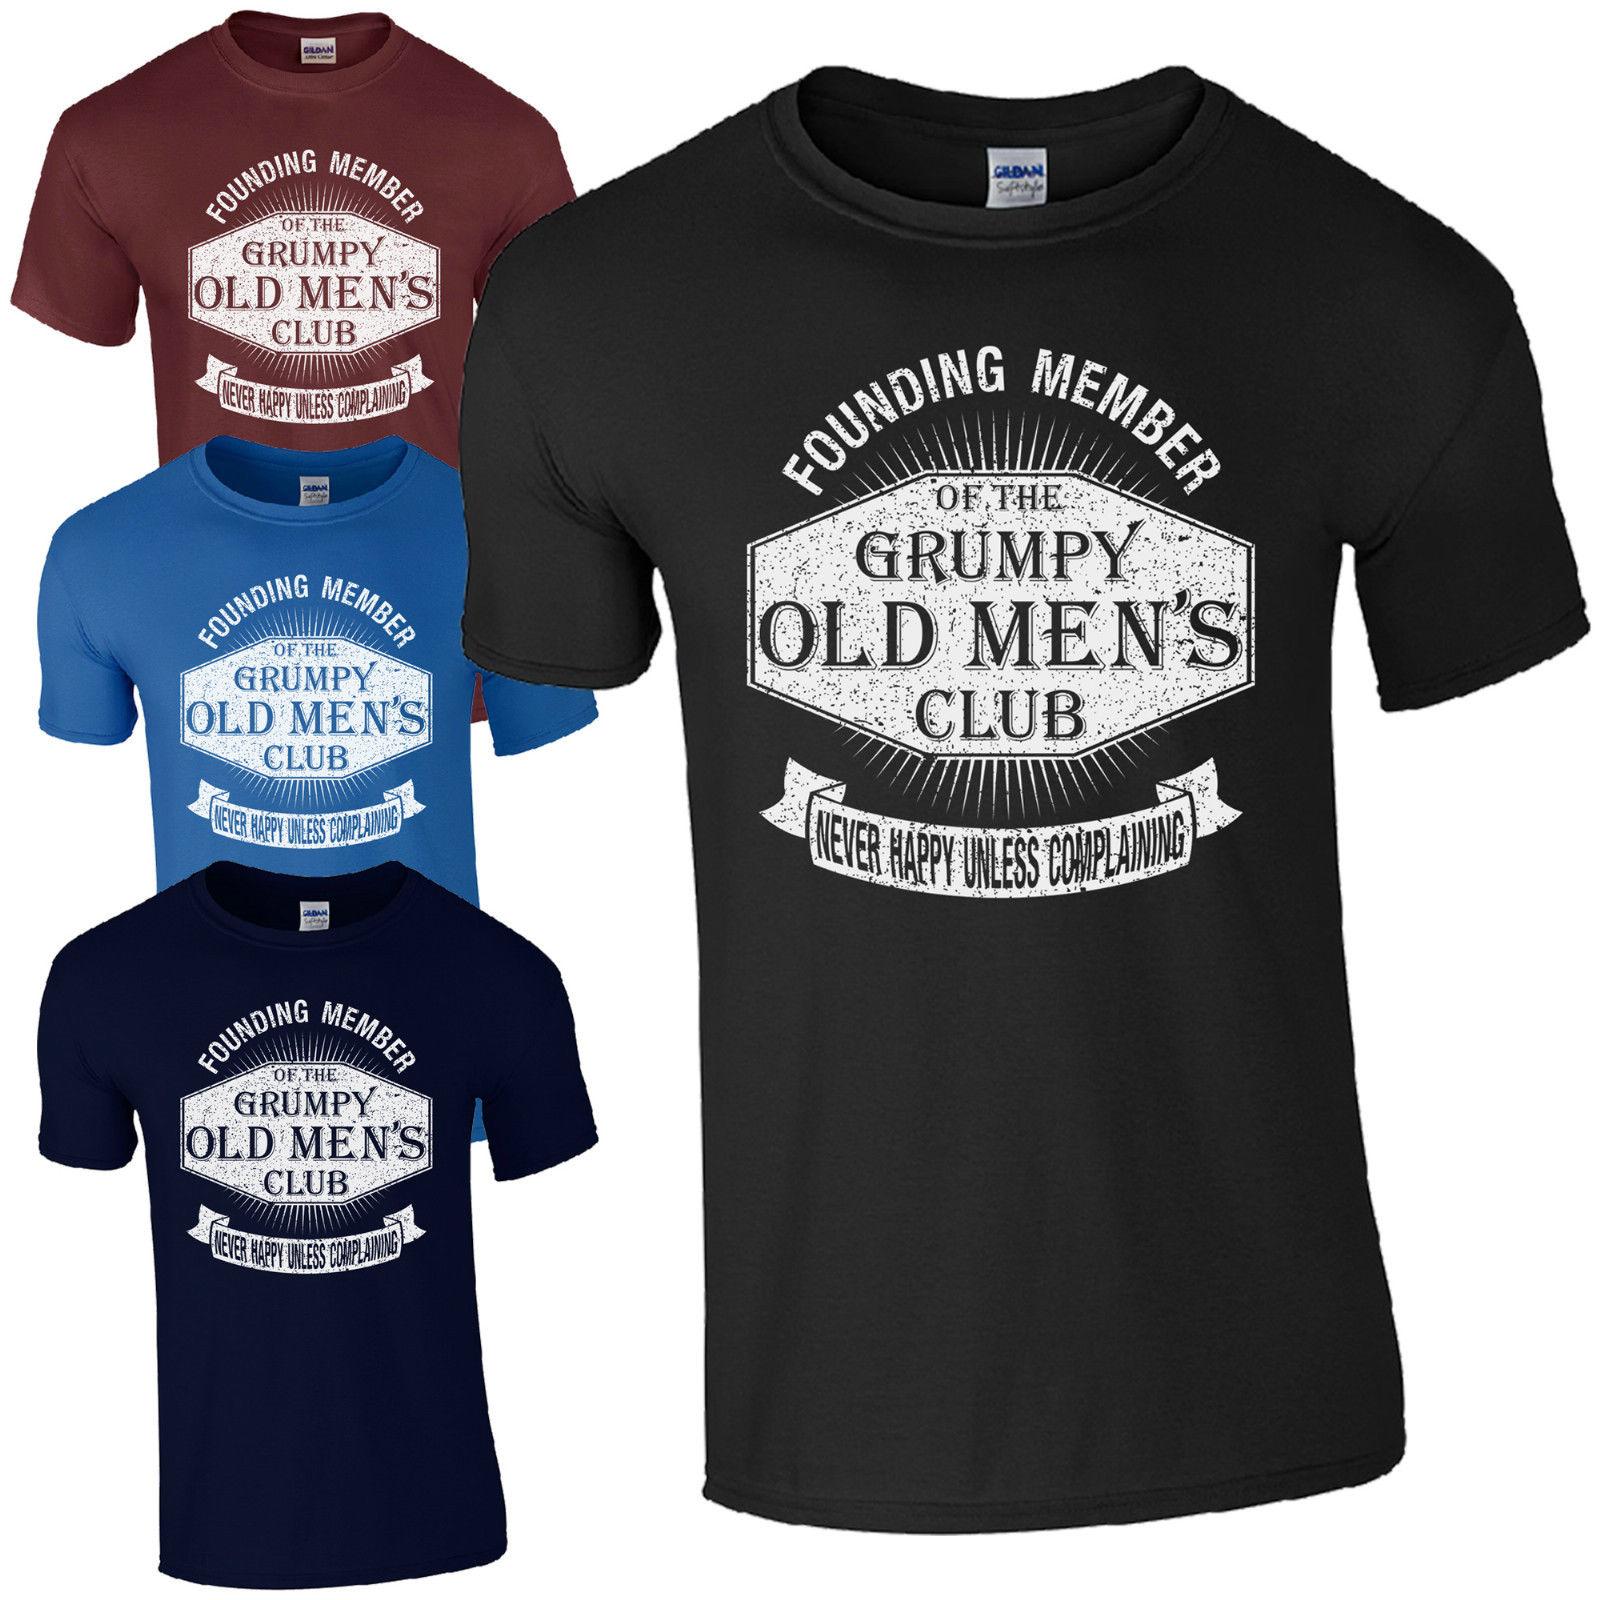 NEW Grumpy Old Mens Club T-Shirt - Funny Dad Grandad Fathers Day Joke Gift Top